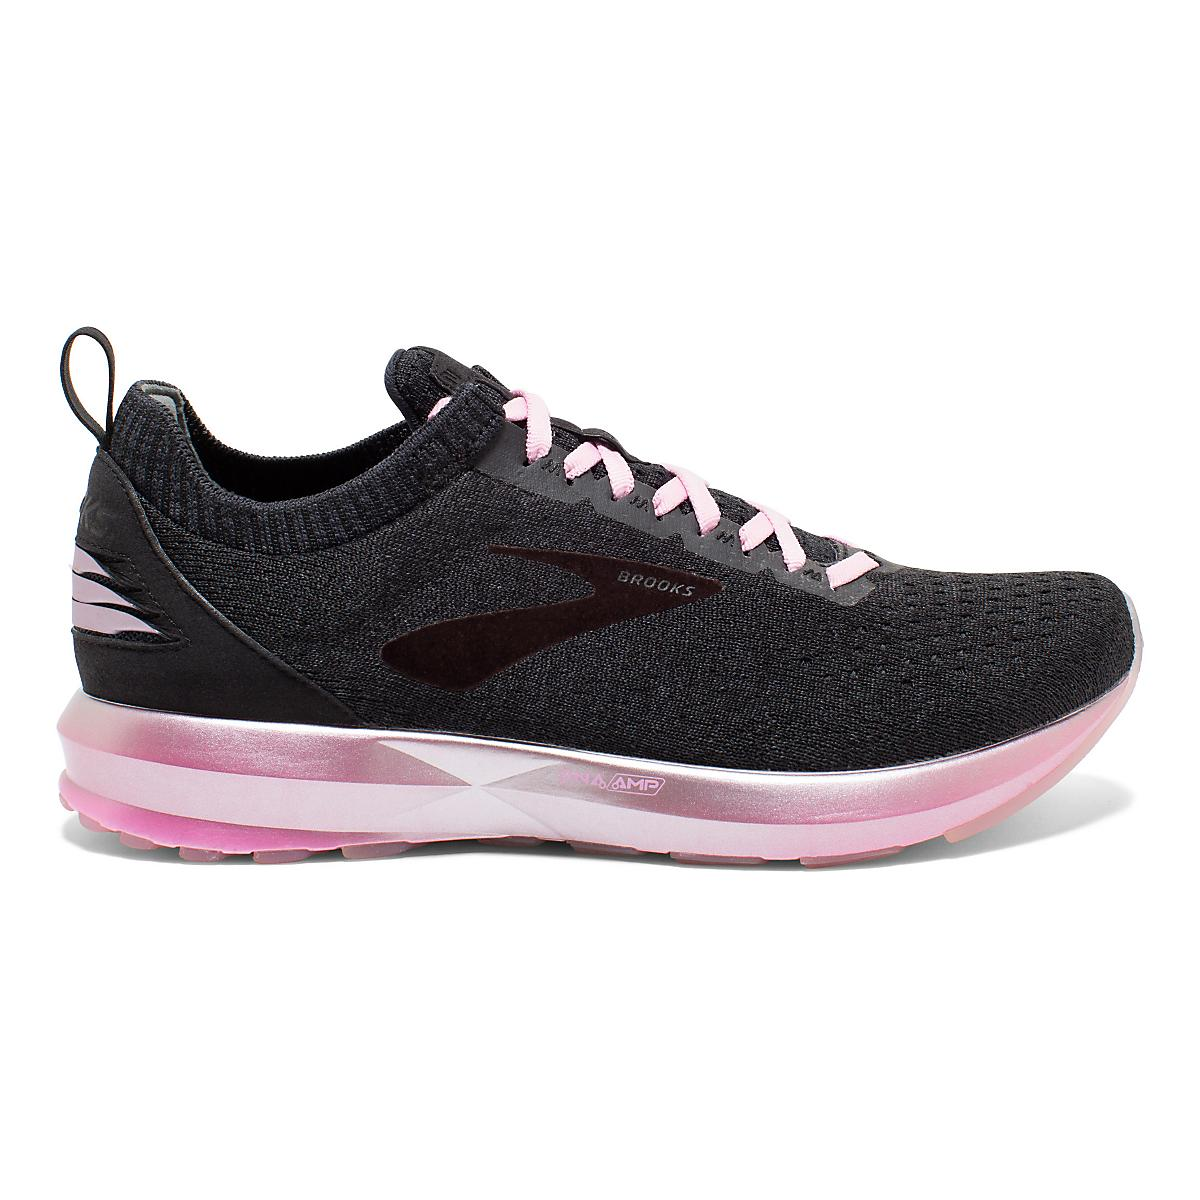 9006d1e22c7da Womens Brooks Levitate 2 LE Running Shoe at Road Runner Sports